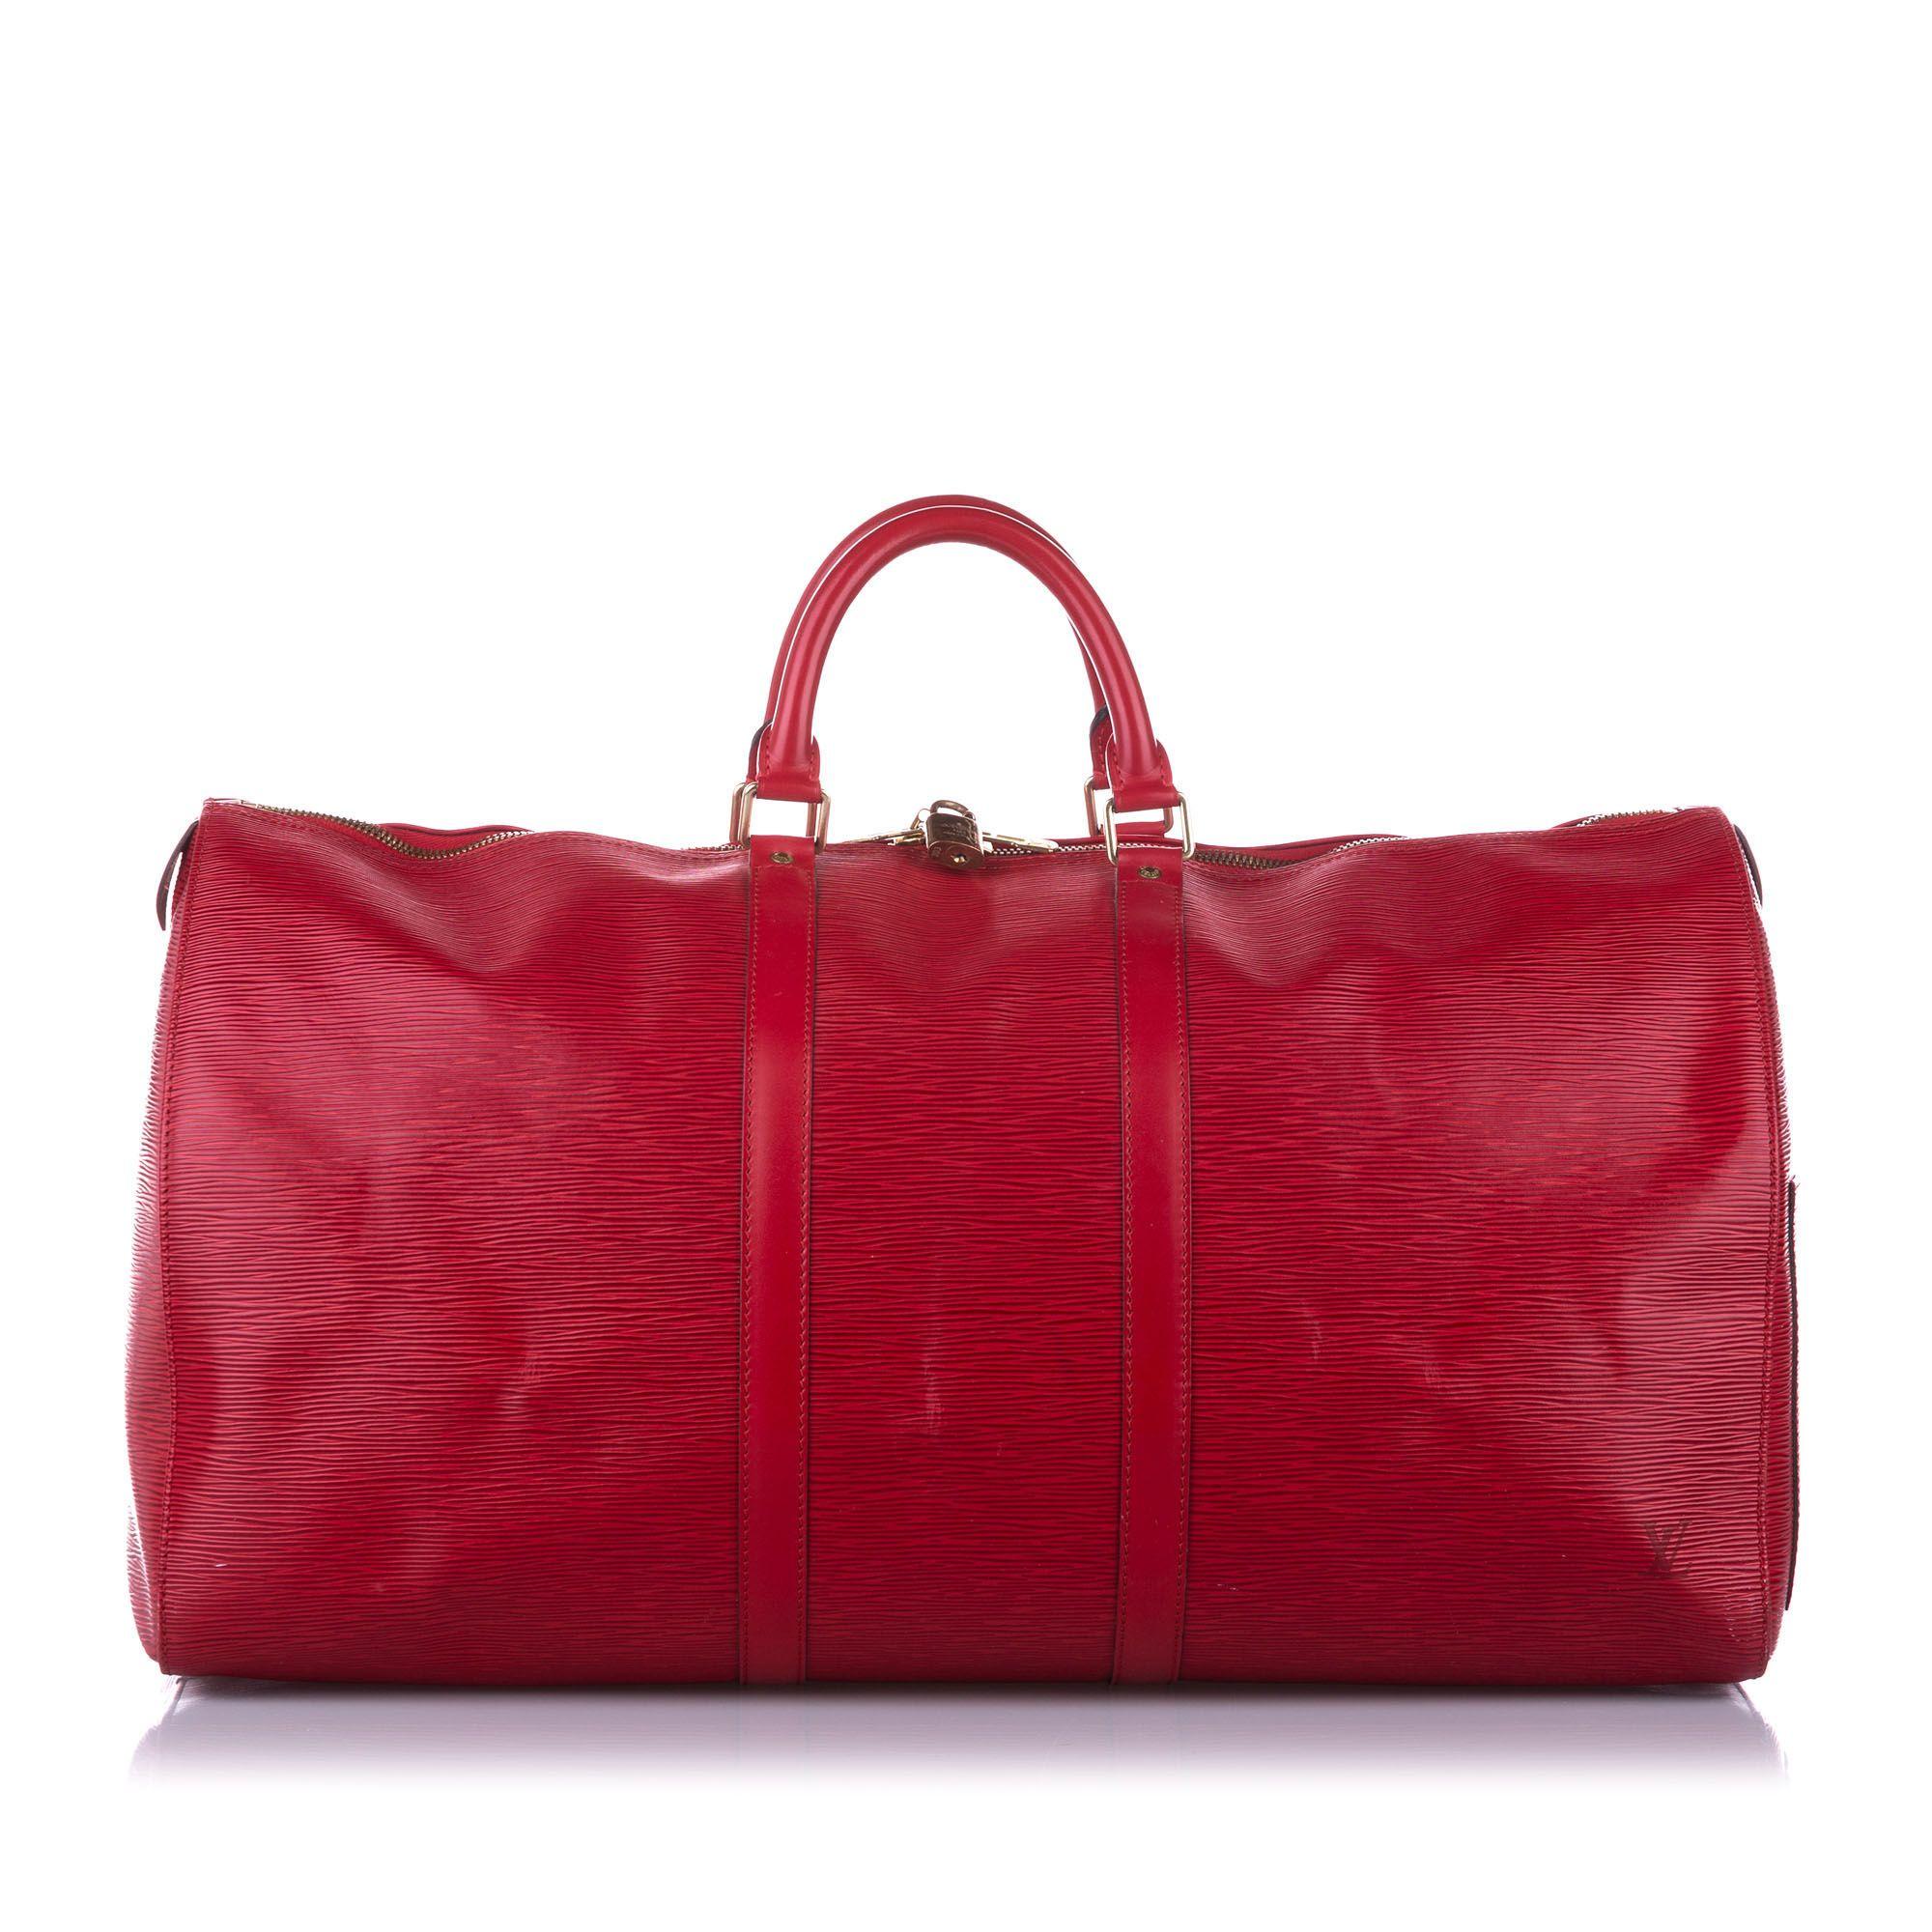 Vintage Louis Vuitton Epi Keepall 55 Red